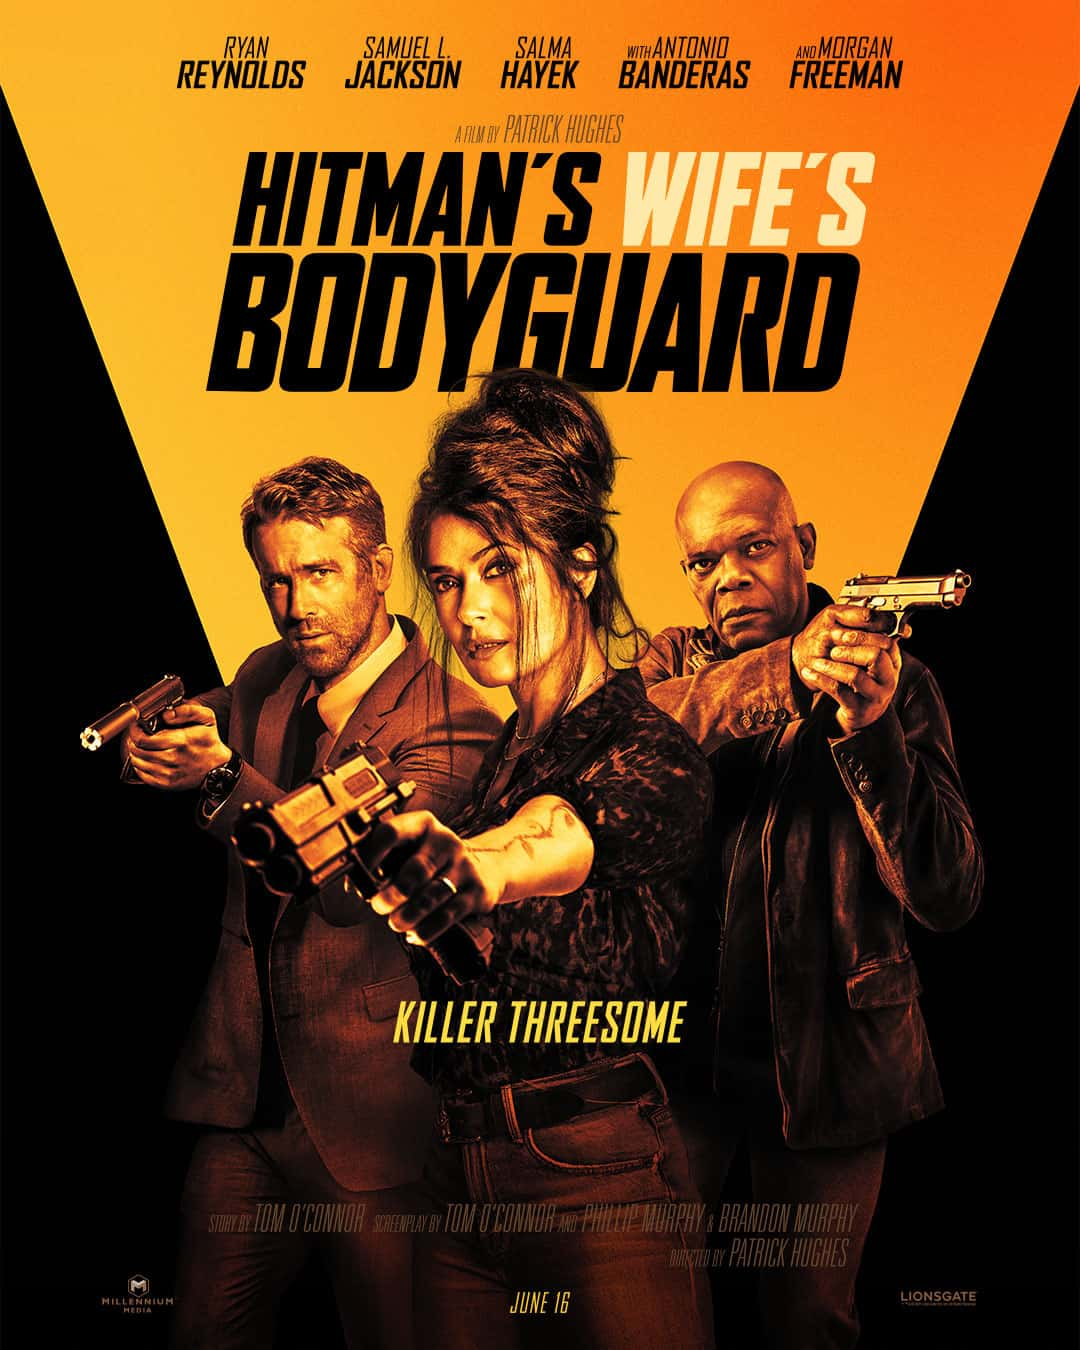 Killers Bodyguard 2 Teaser Poster 2